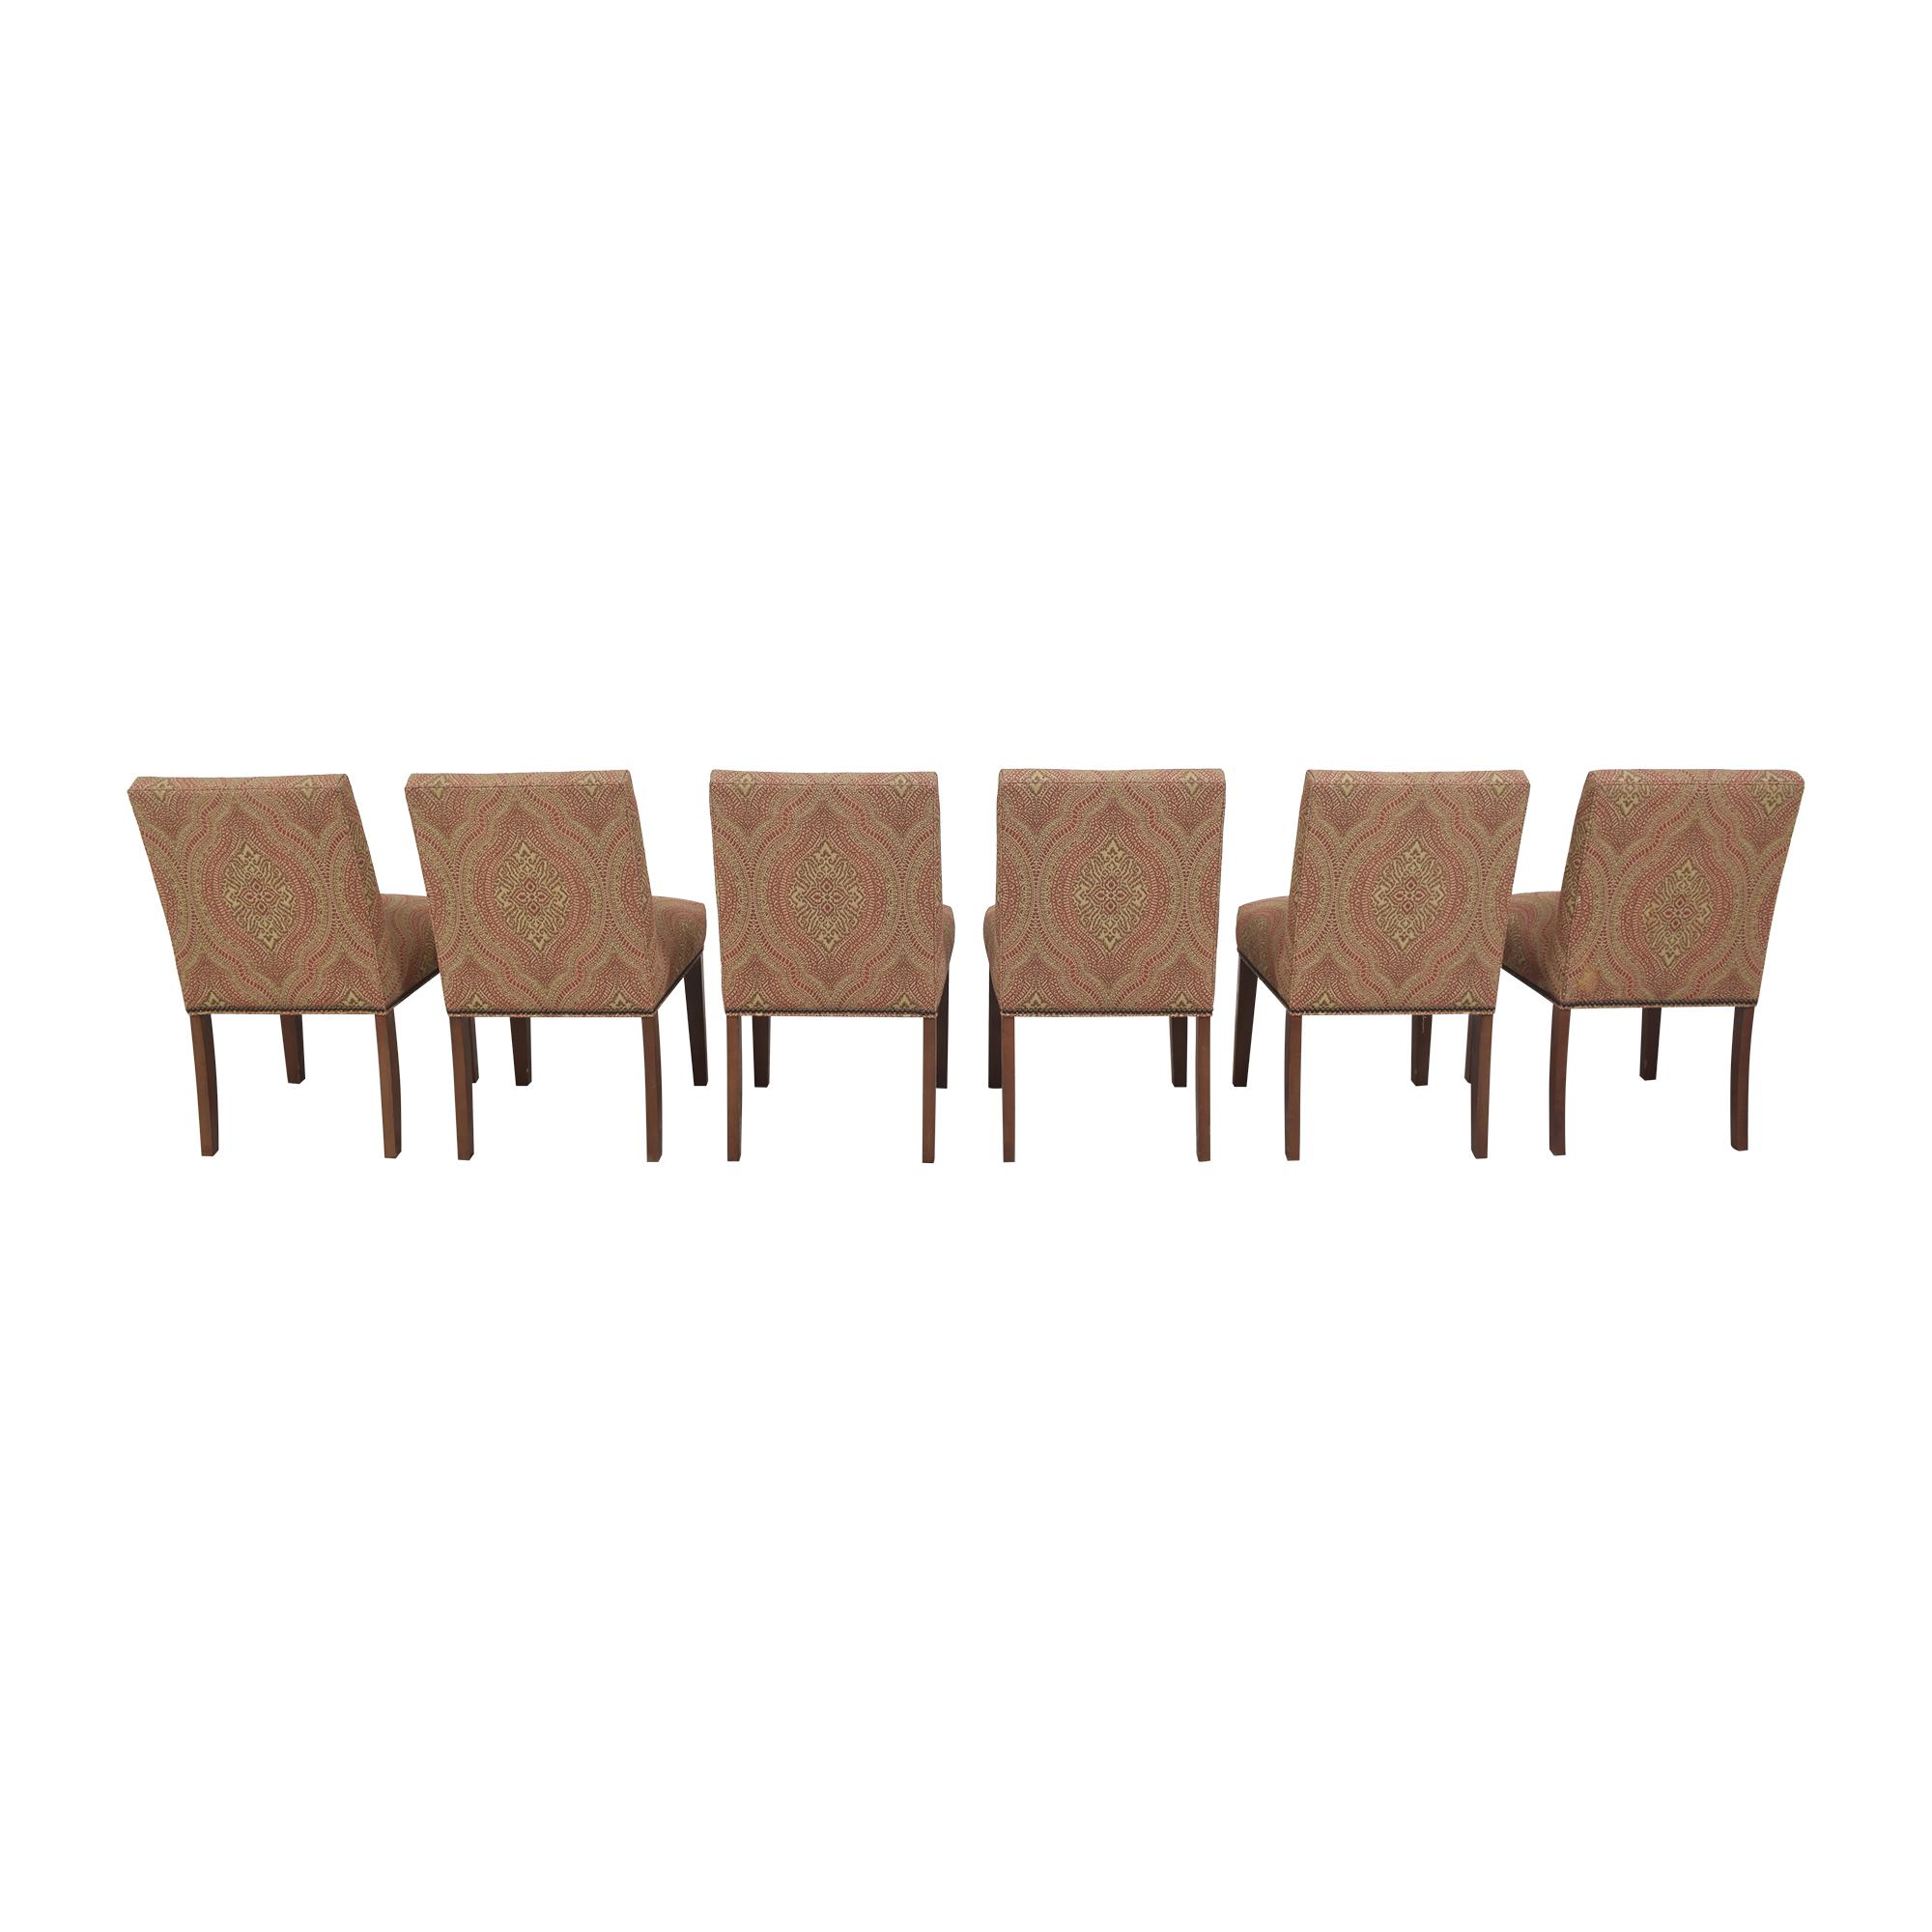 Ethan Allen Sebago Dining Chairs sale